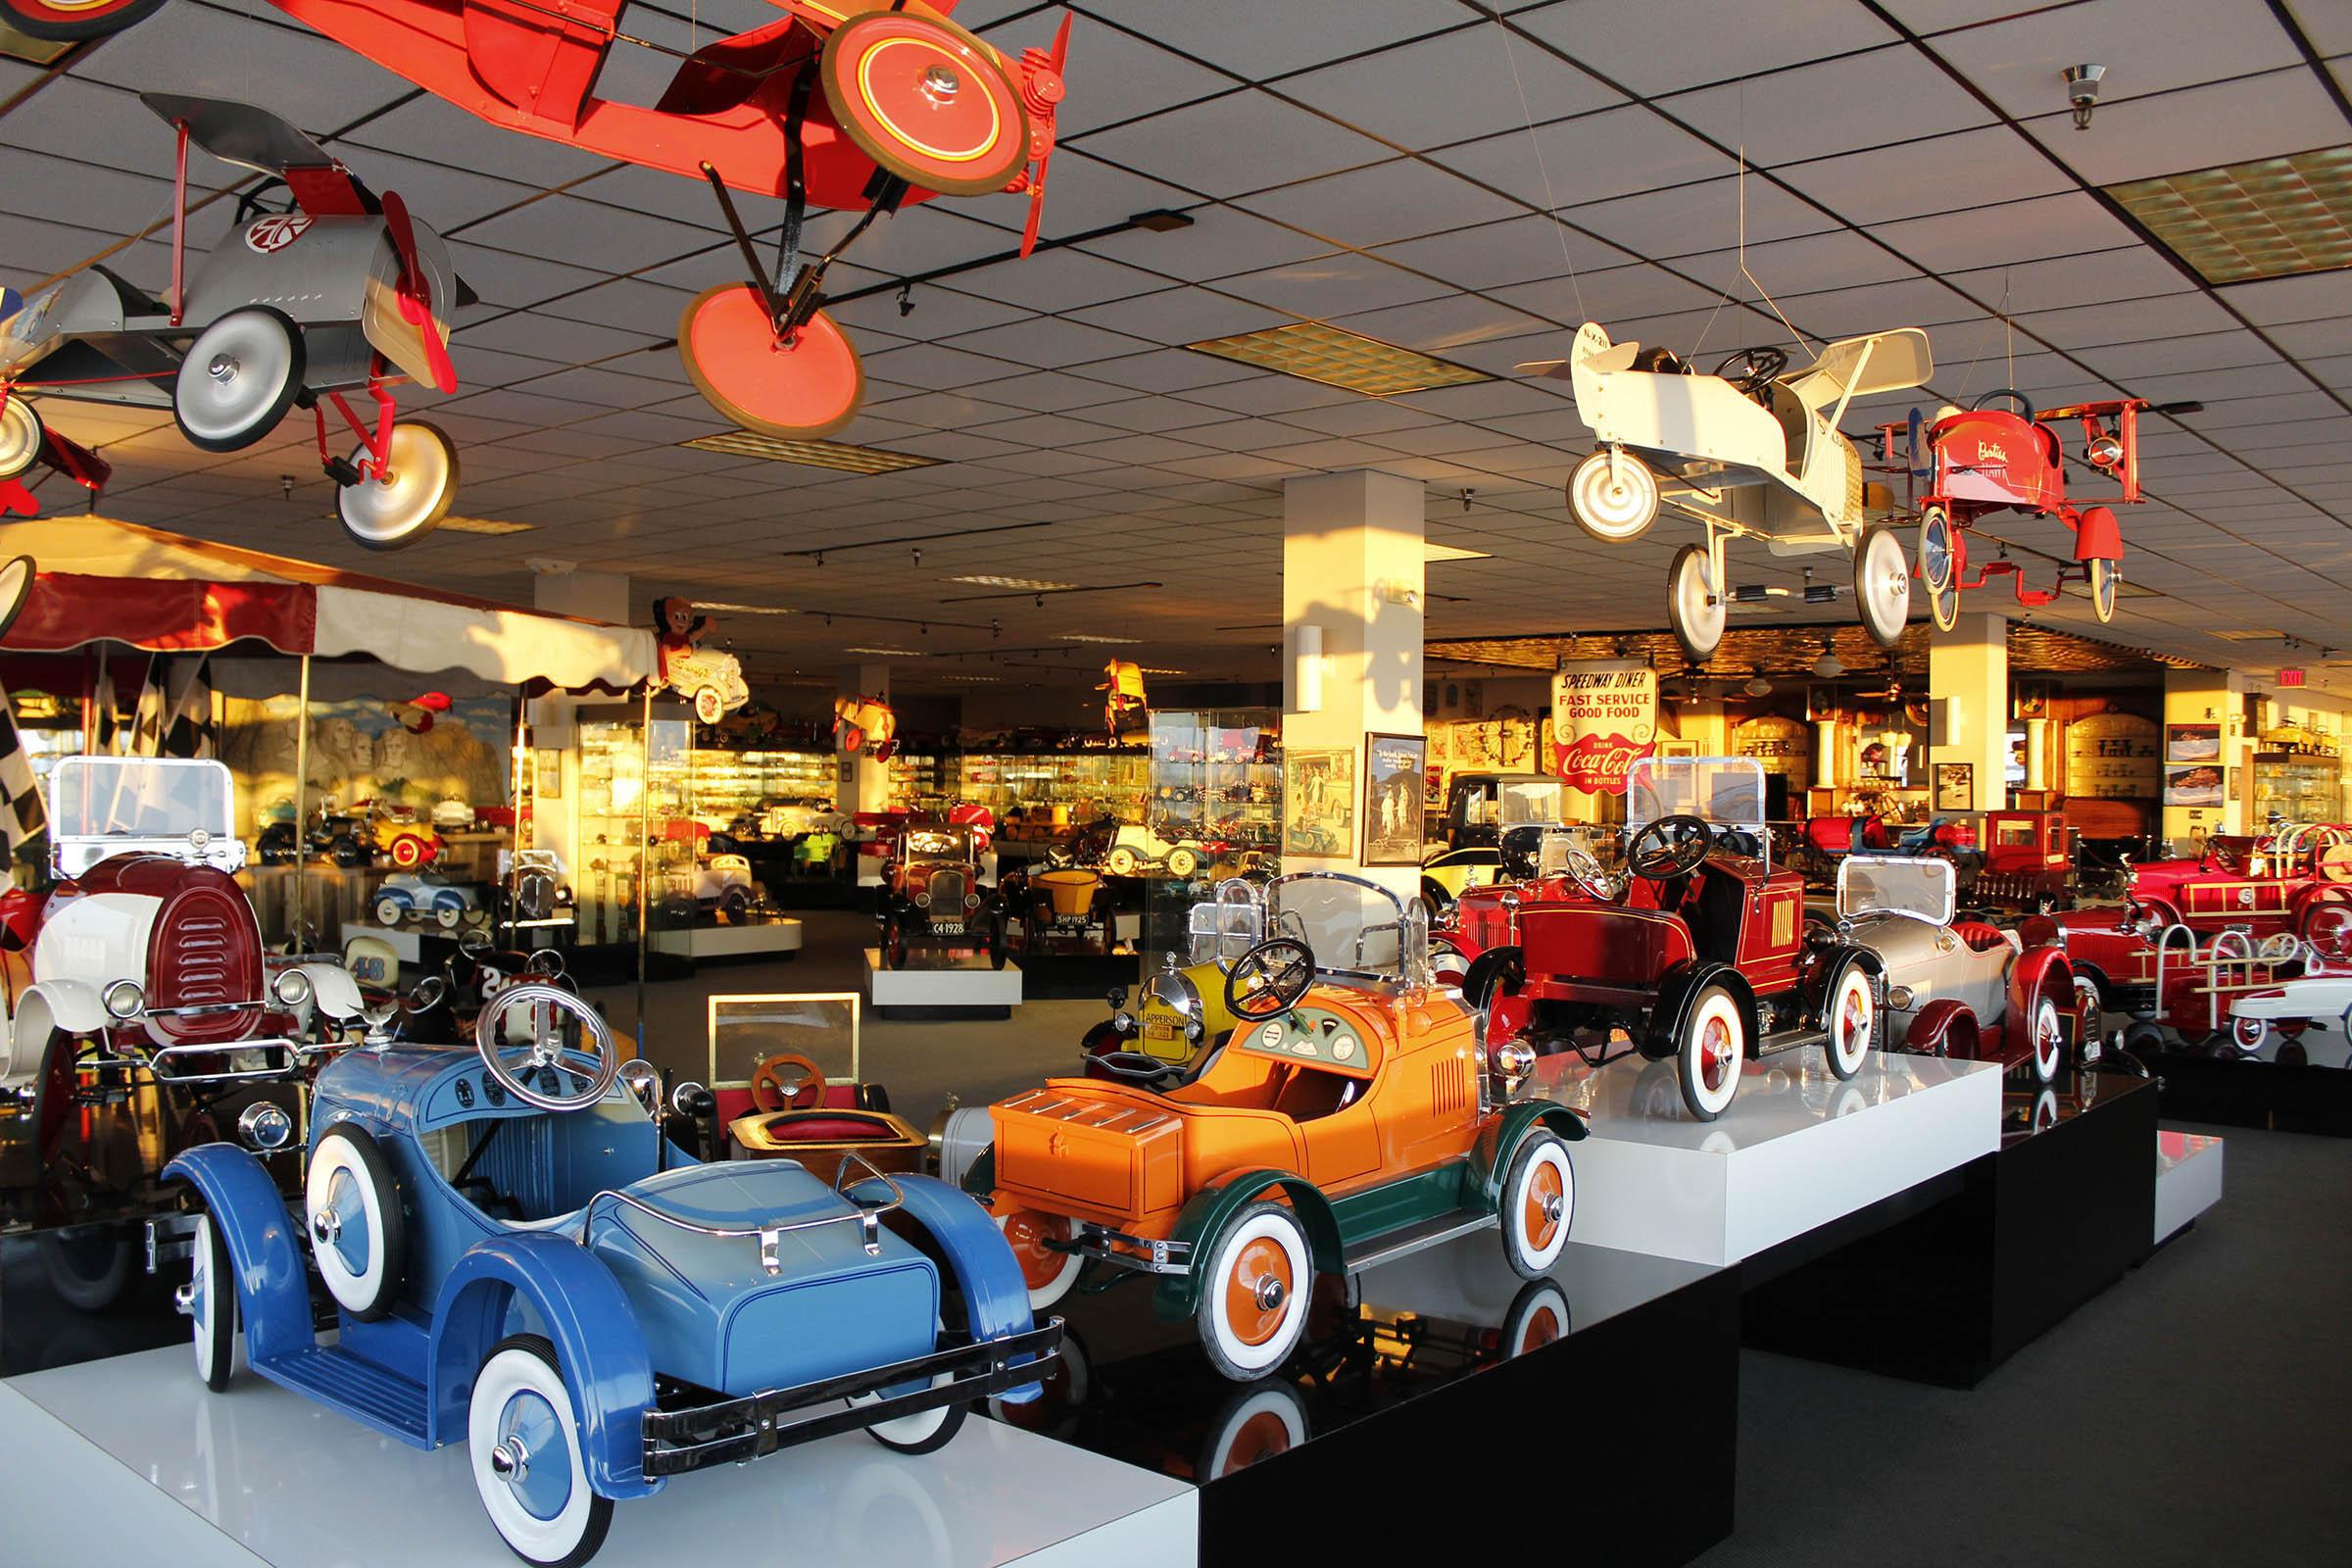 3rd Floor Pedal Cars, Museum of American Speed